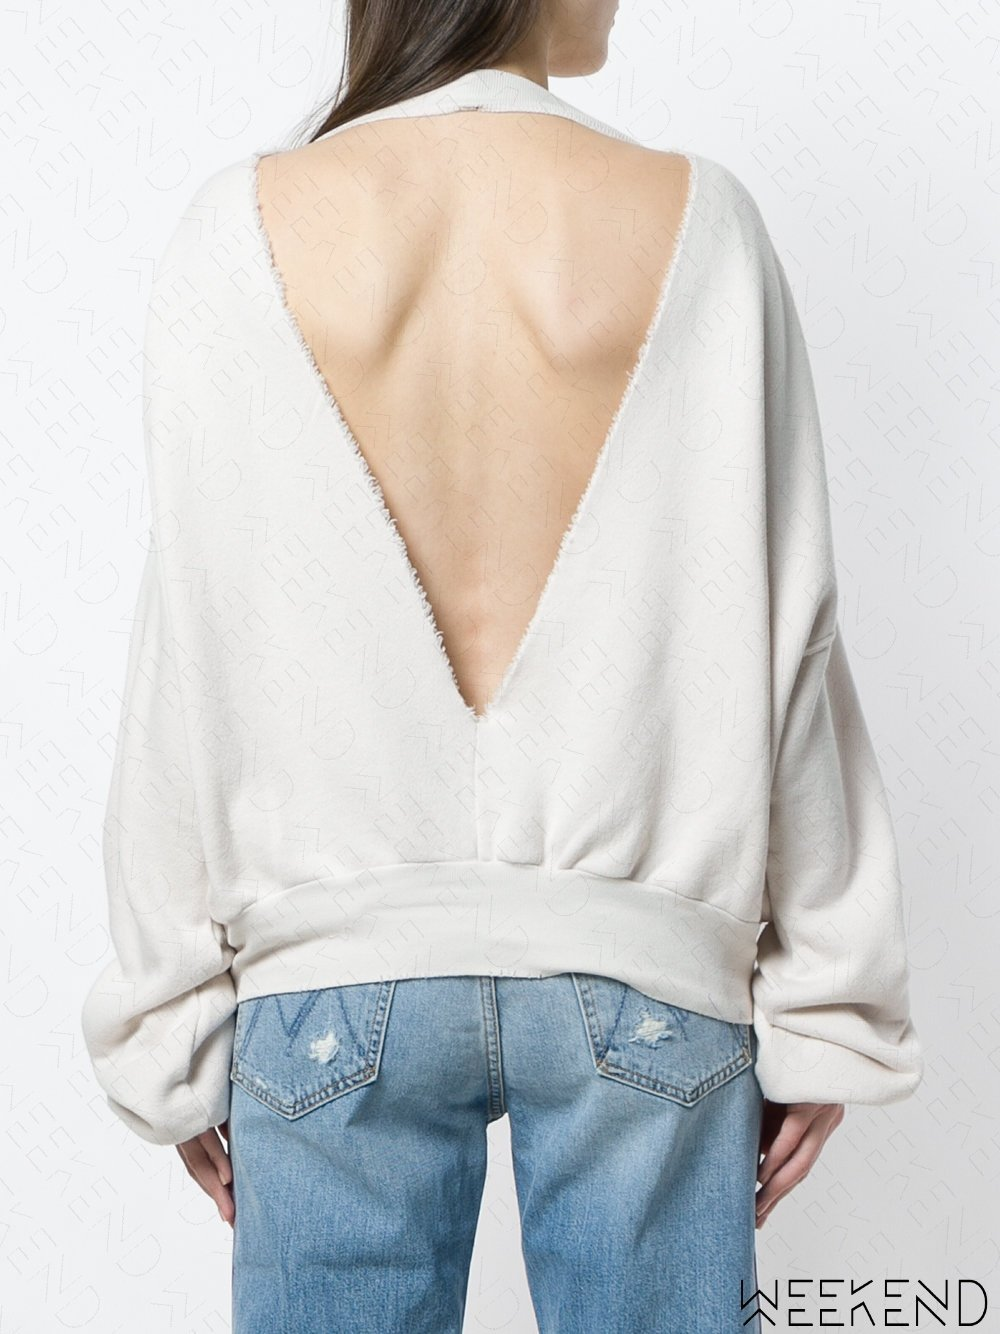 【WEEKEND】 UNRAVEL 大深V 露背 落肩 寬鬆 長袖 衛衣 上衣 米白色 18春夏新款